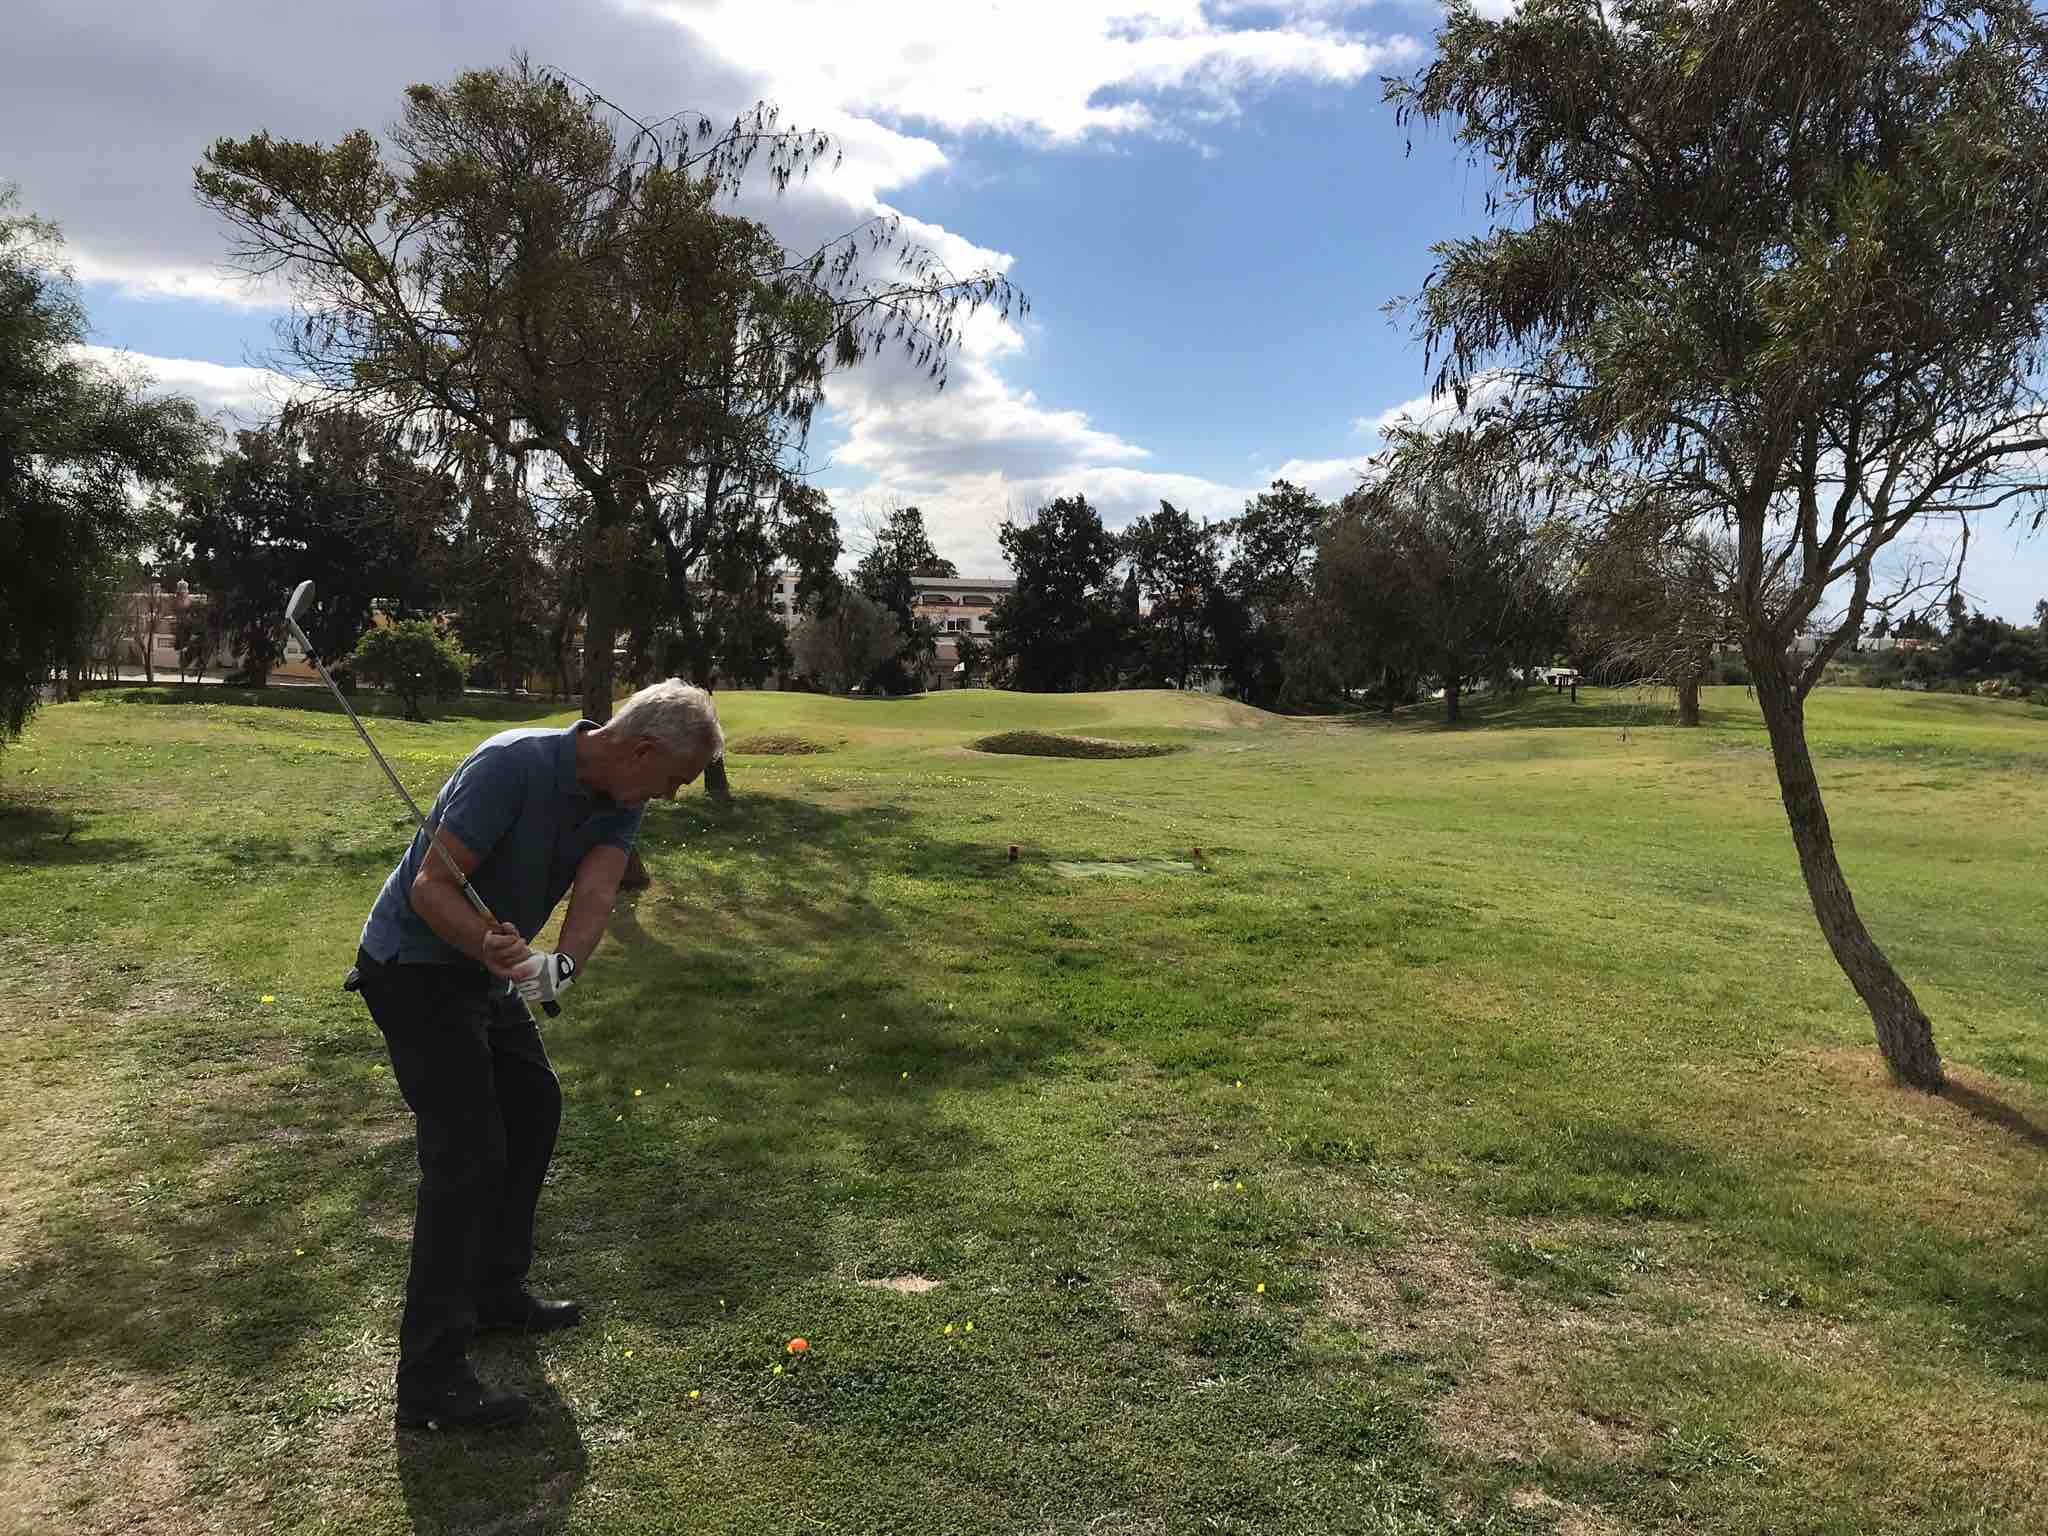 Montinho golf